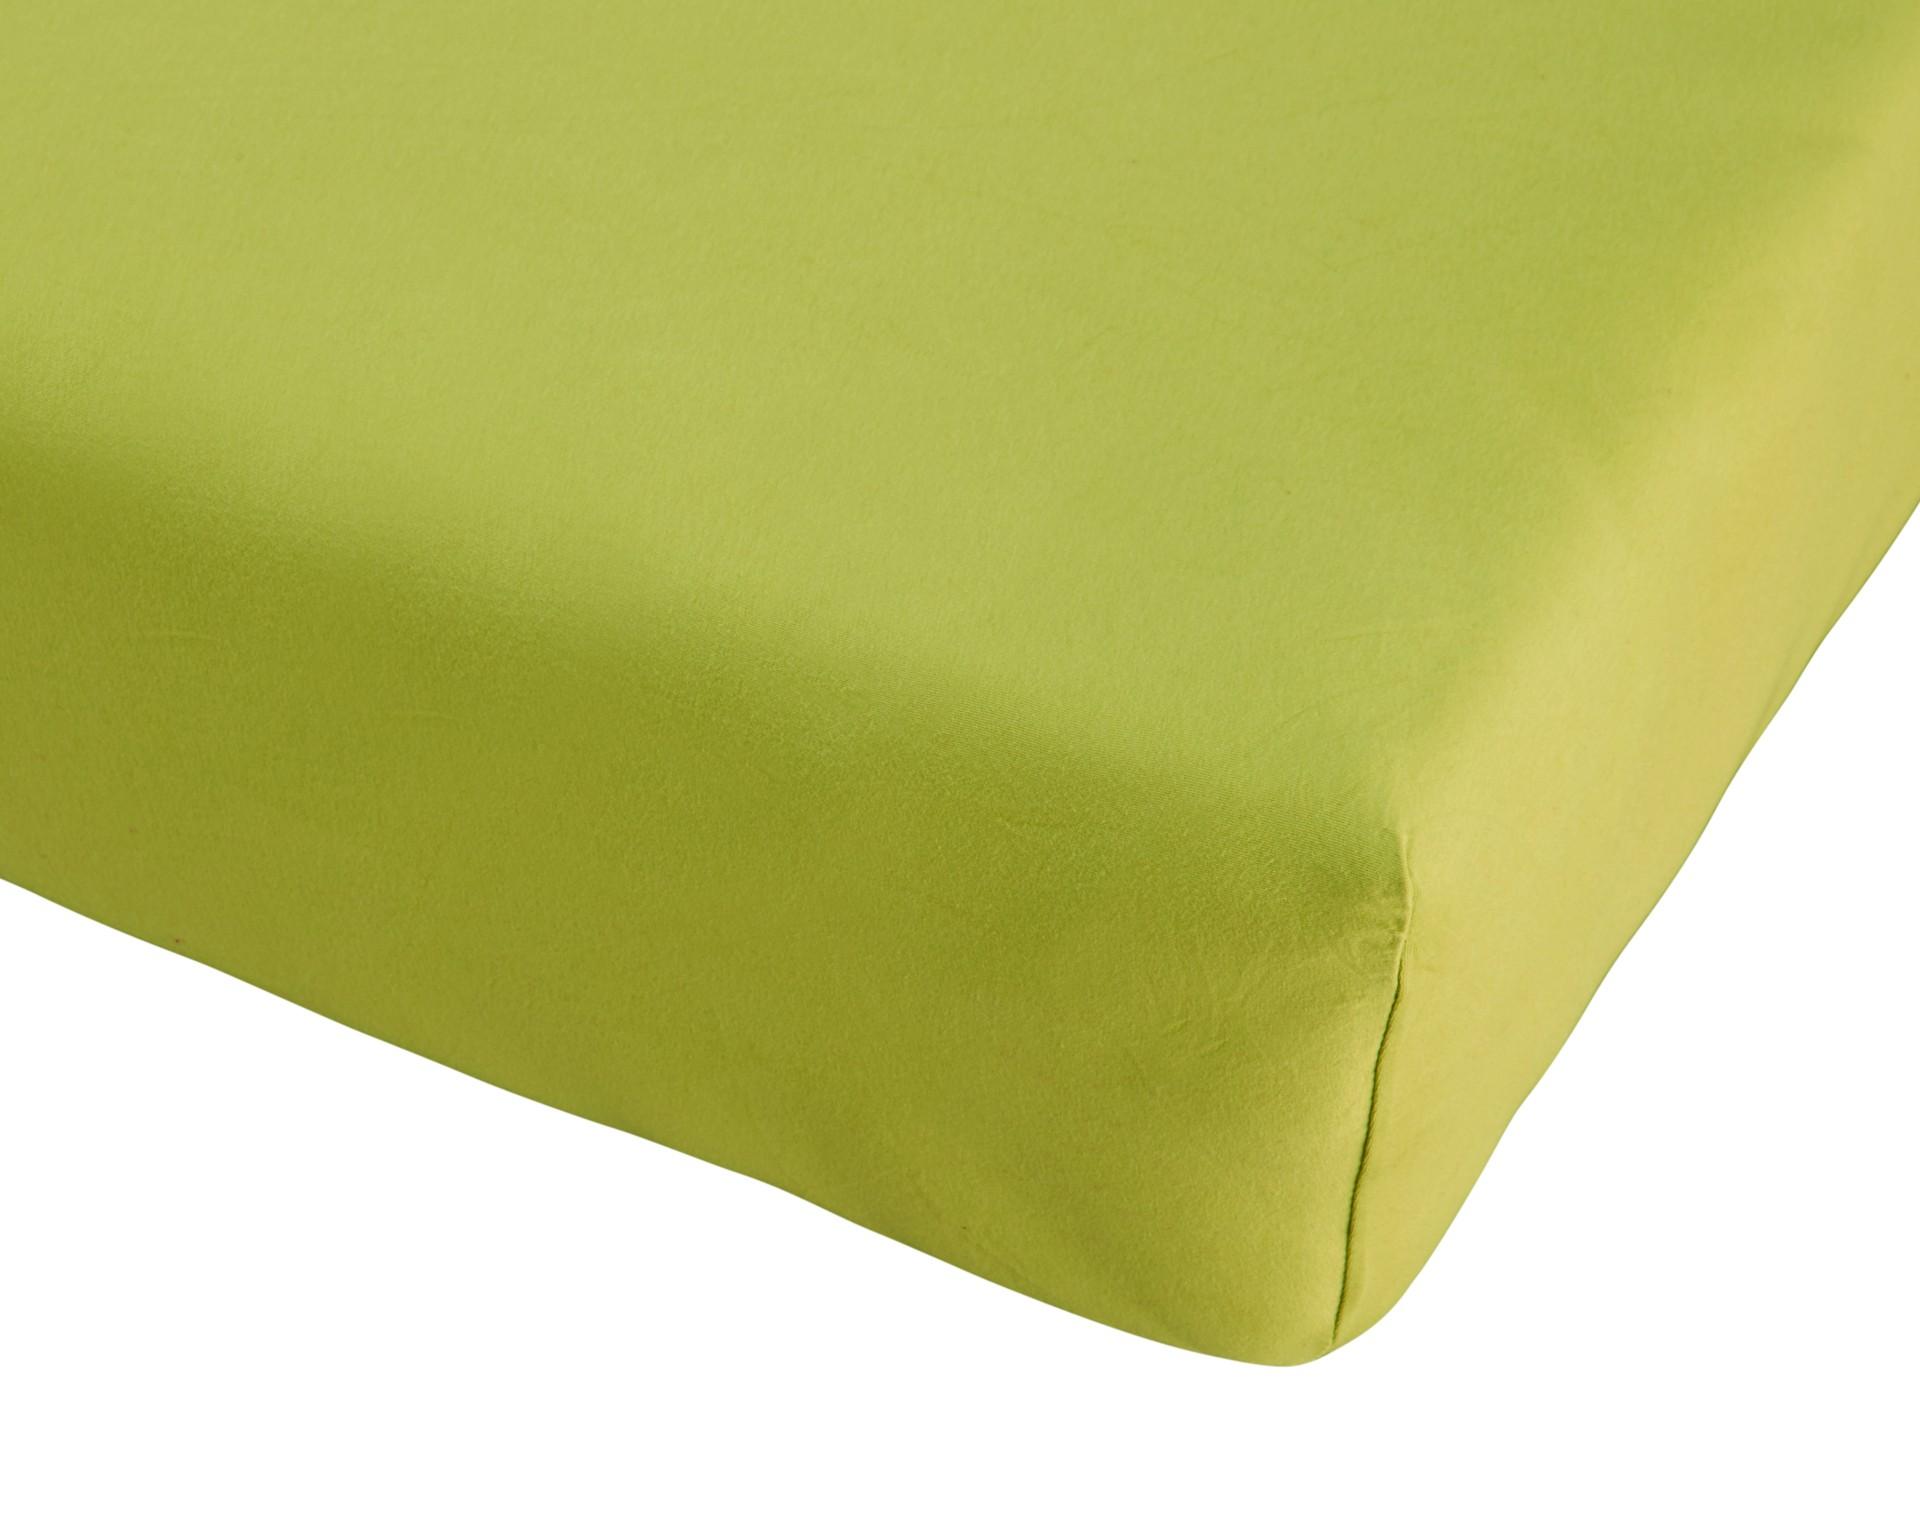 Jersey-Spannbettlaken Exklusiv (140-150x190-220, lindgrün)